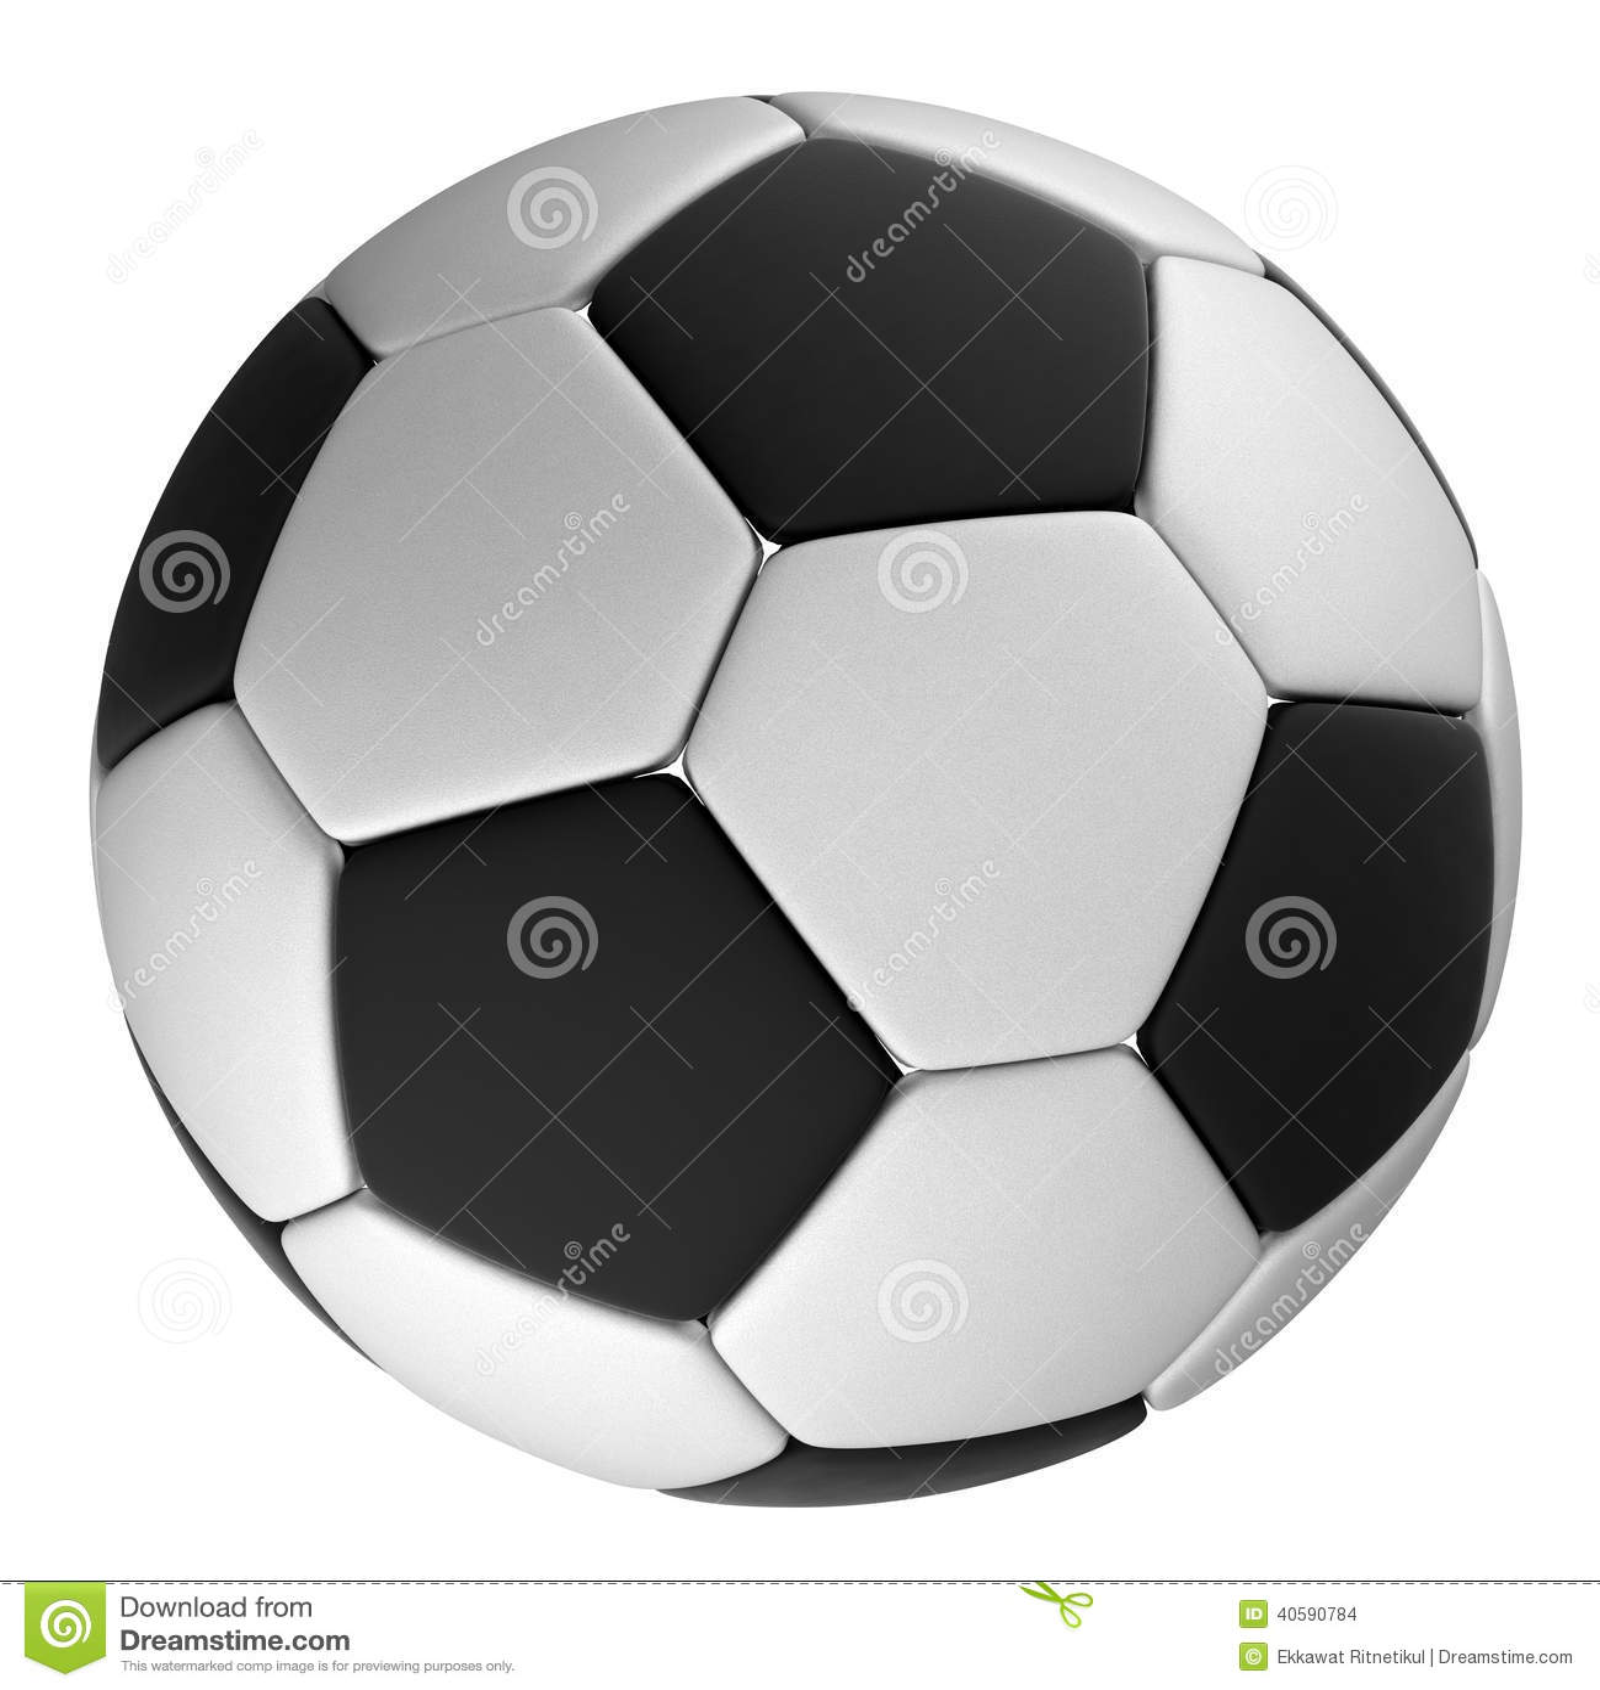 Fotos de bolas de futsal 51